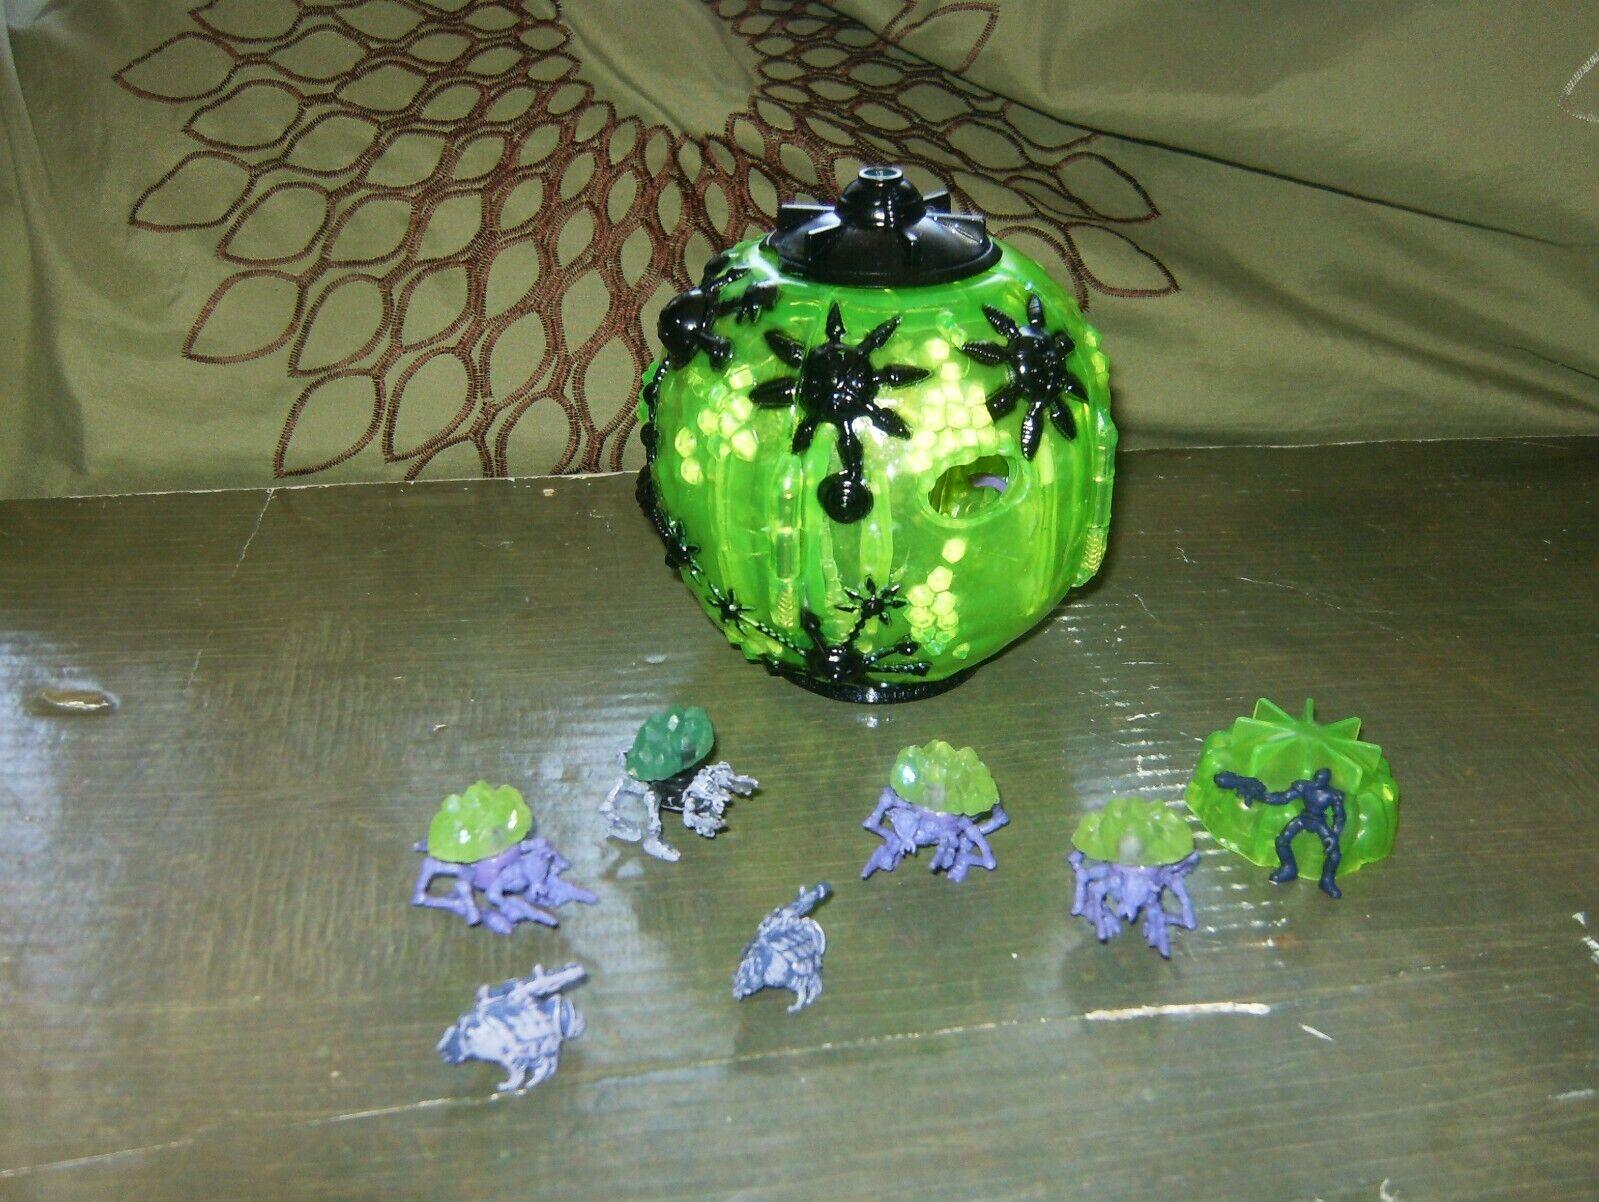 Trendmasters War Planets Shadow Raiders Ice Green Green Green acbd7c